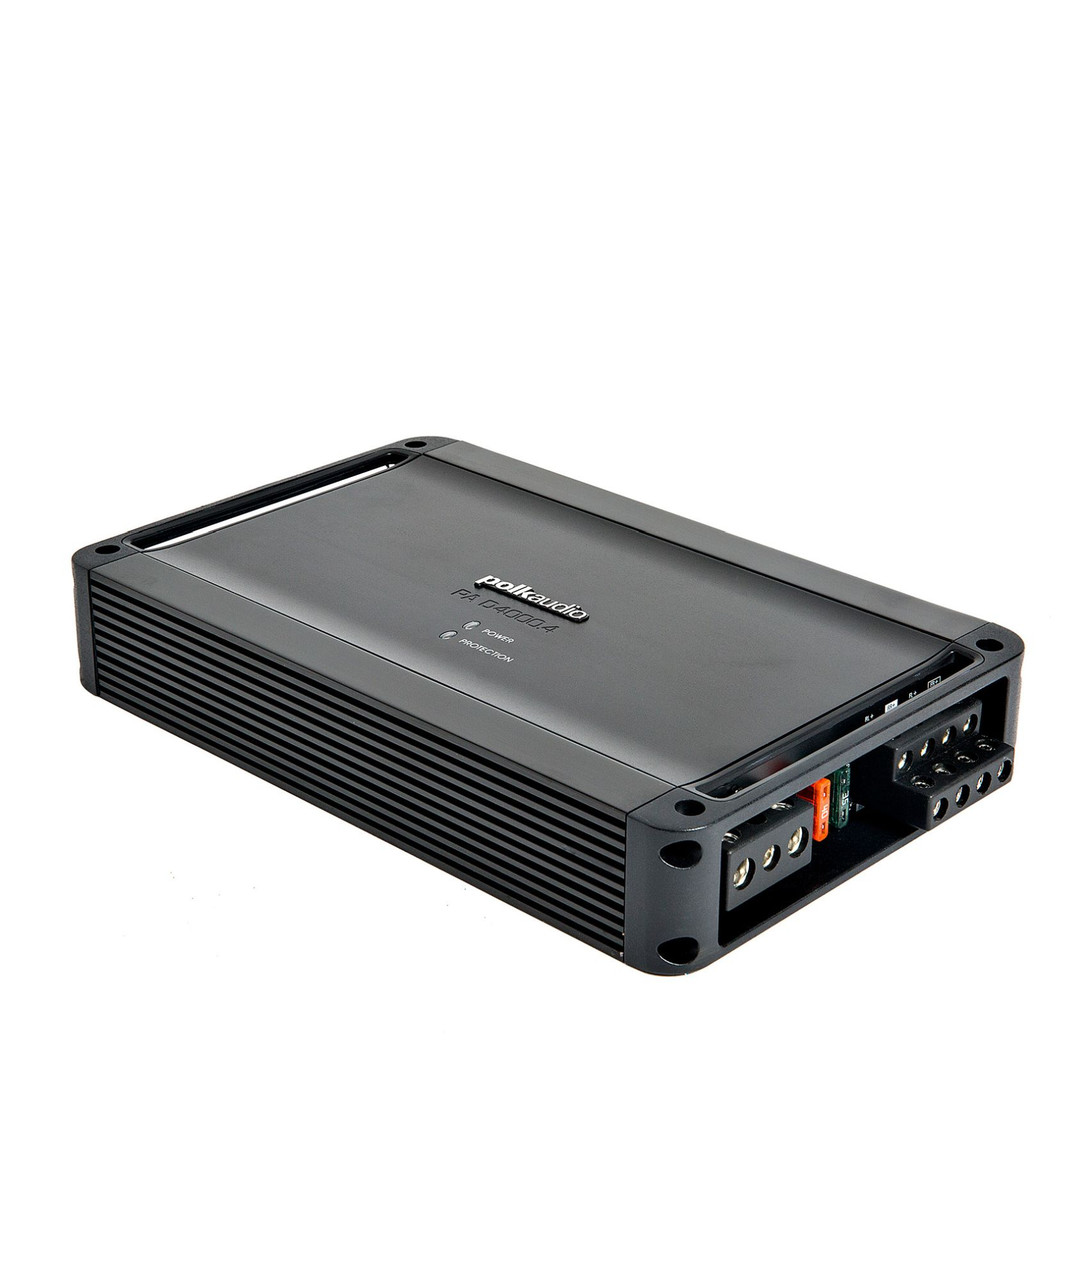 small resolution of polk audio bundle a pair of db652 6 5 speakers a pair of db572 5x7 speakers pa d4000 4 amplifier wire kit creative audio